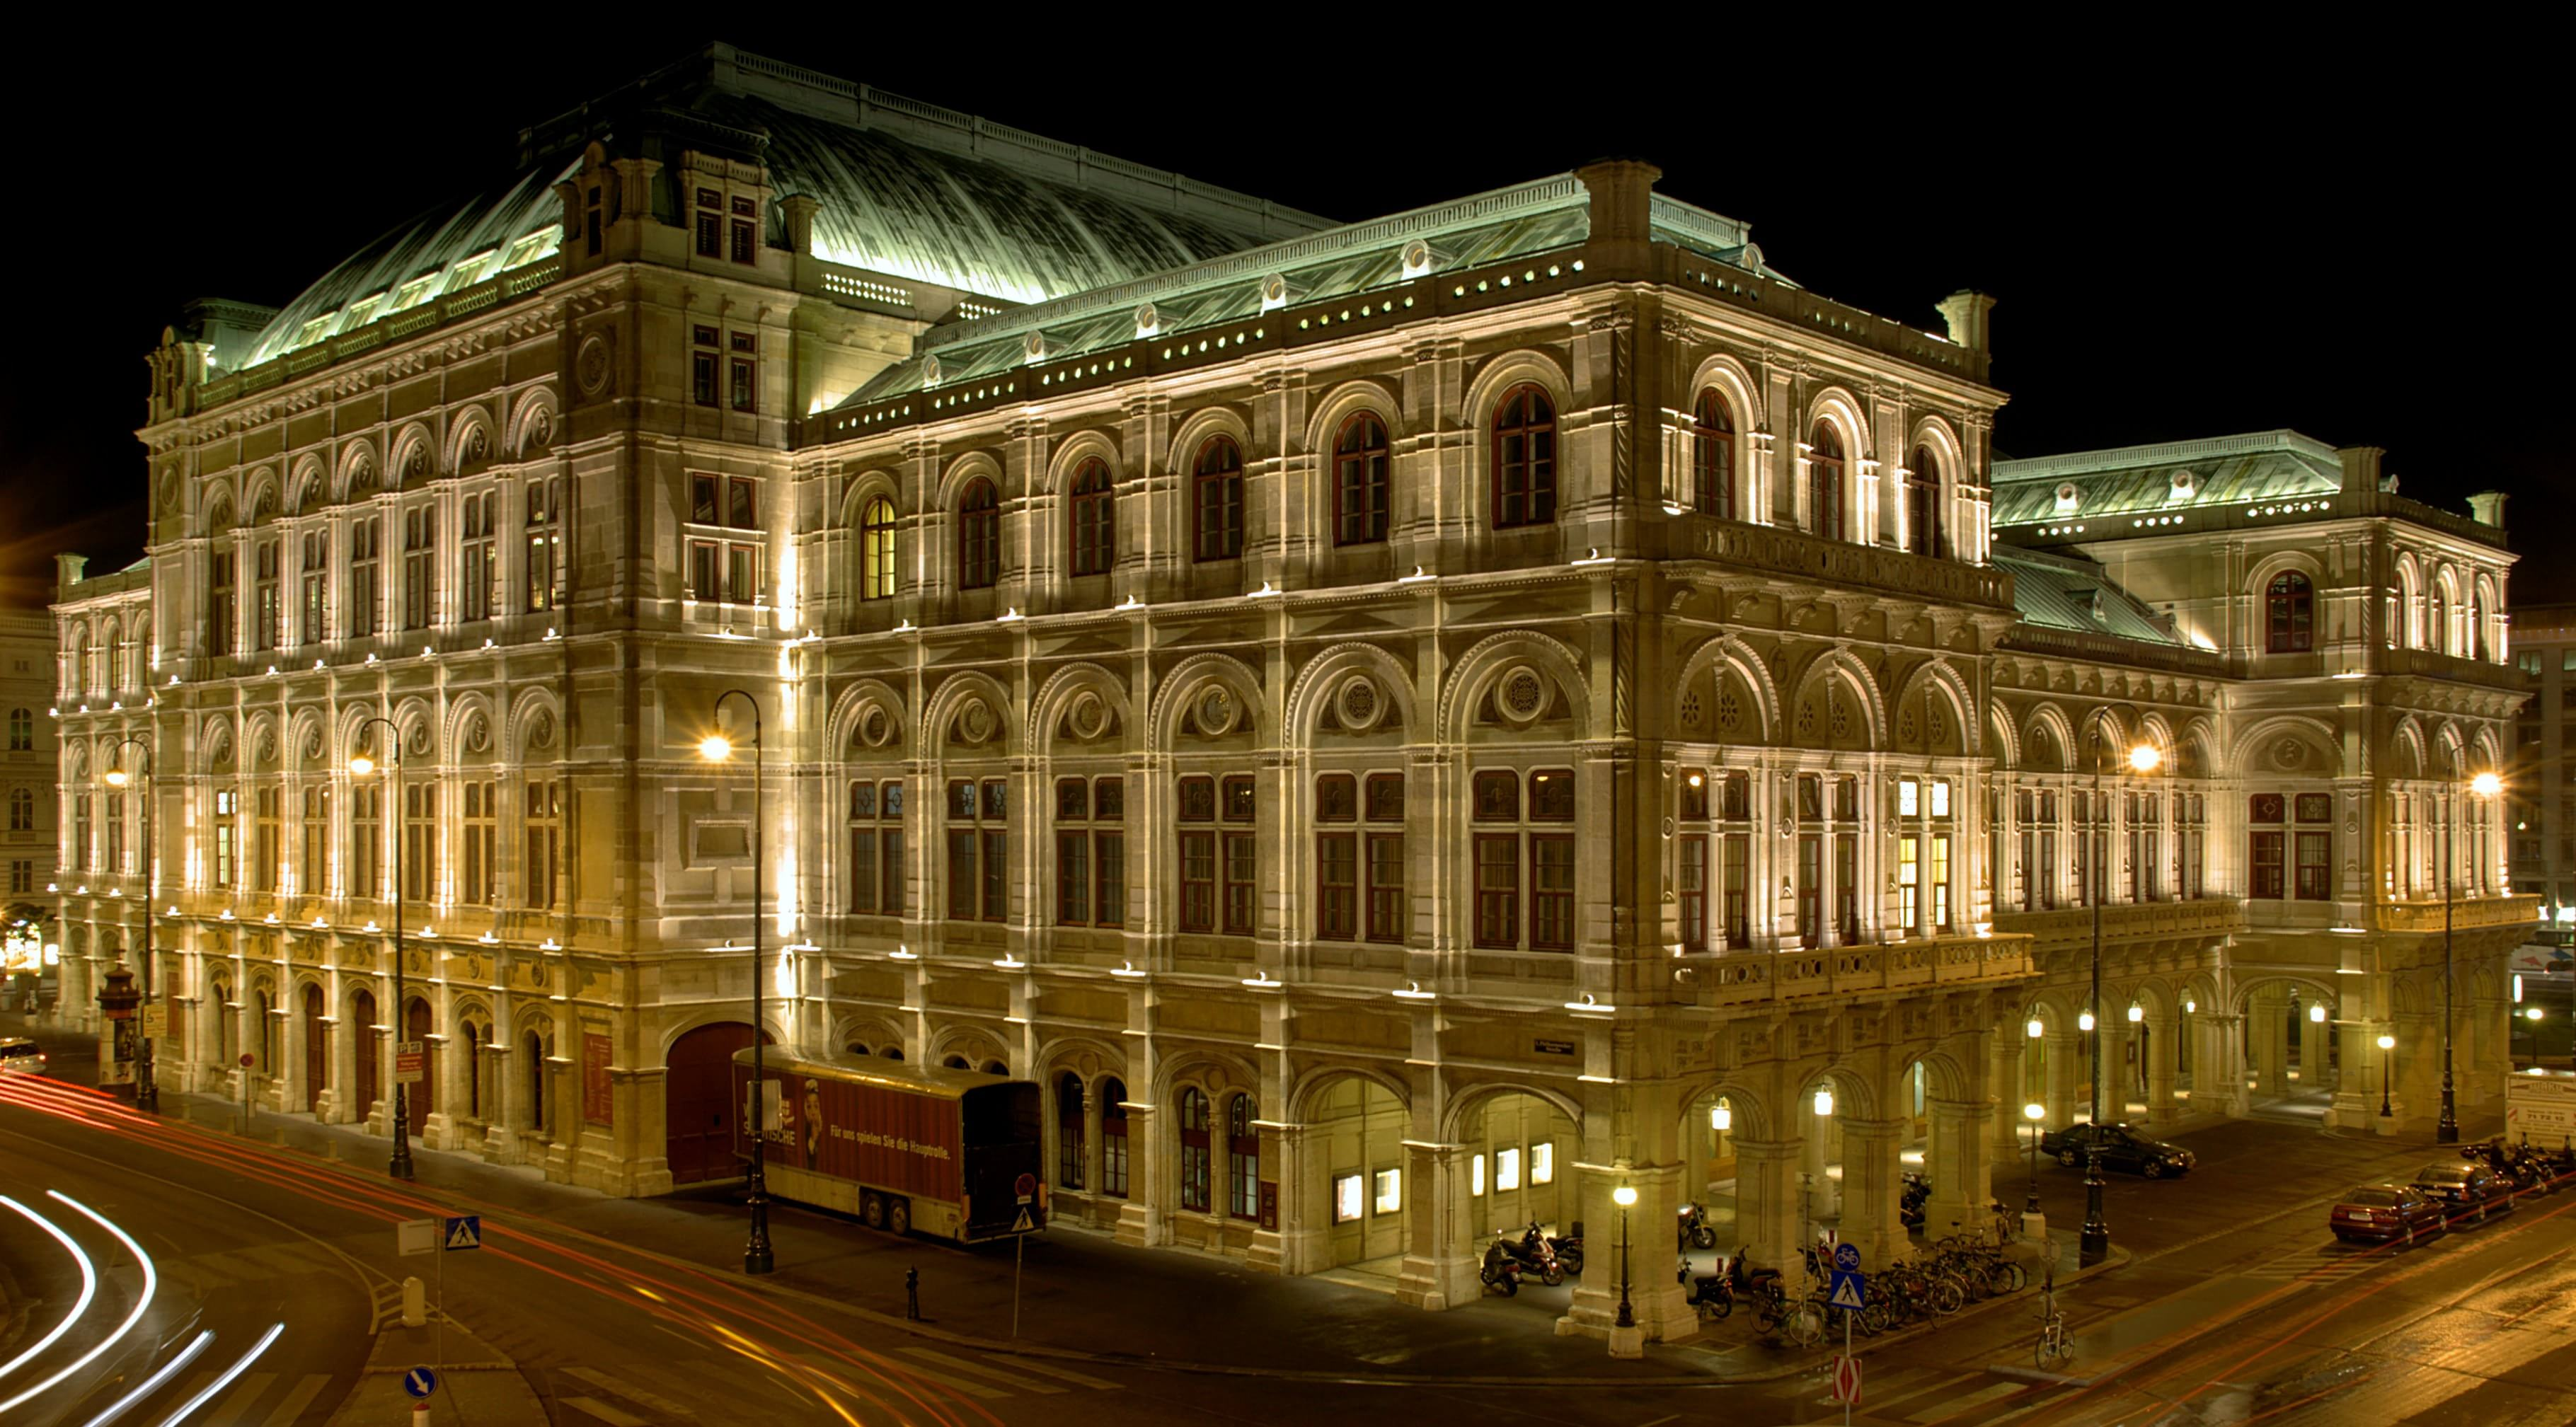 Opera-Viena-viaje-sorpresa-wishandfly